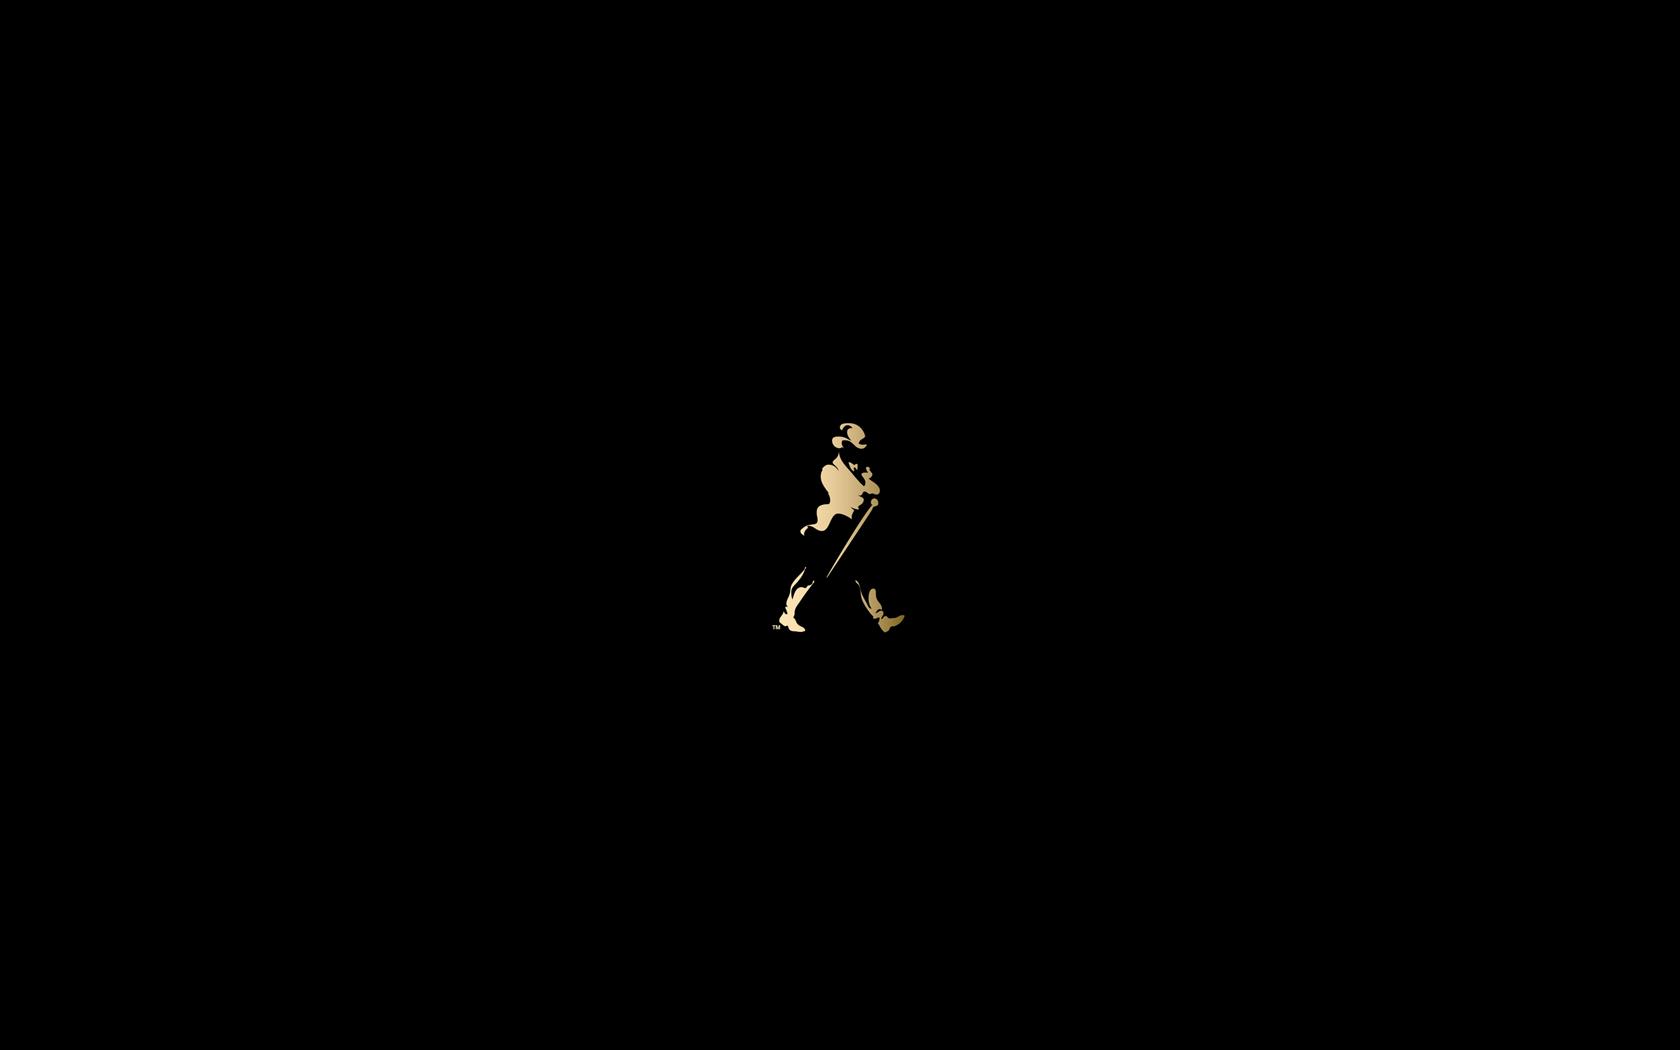 Johnnie walker - Walker PNG HD